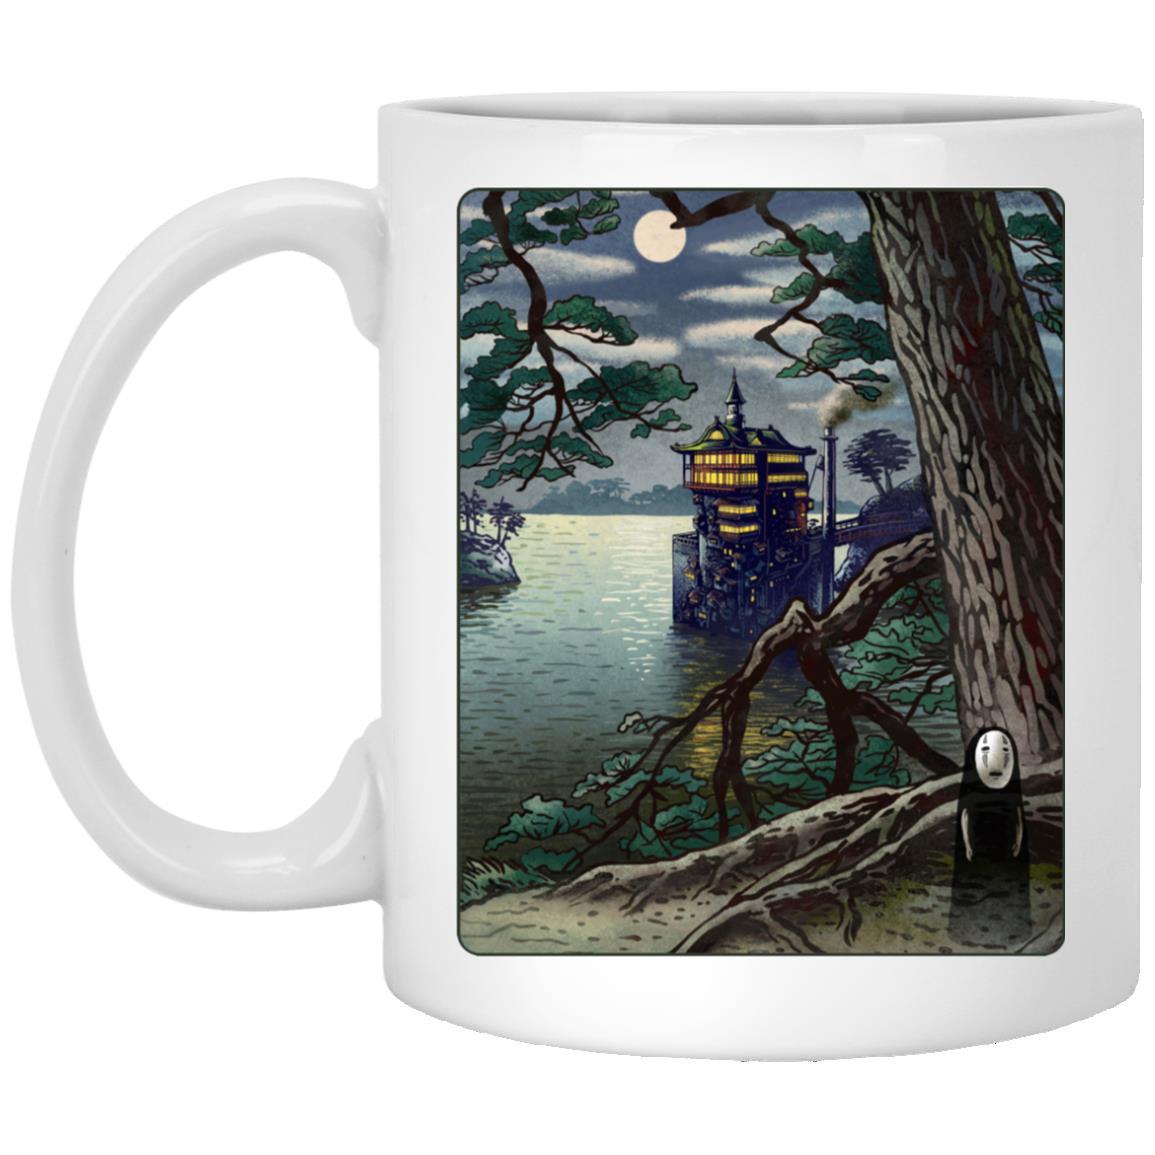 Spirited Away – Magical Bath House Mug